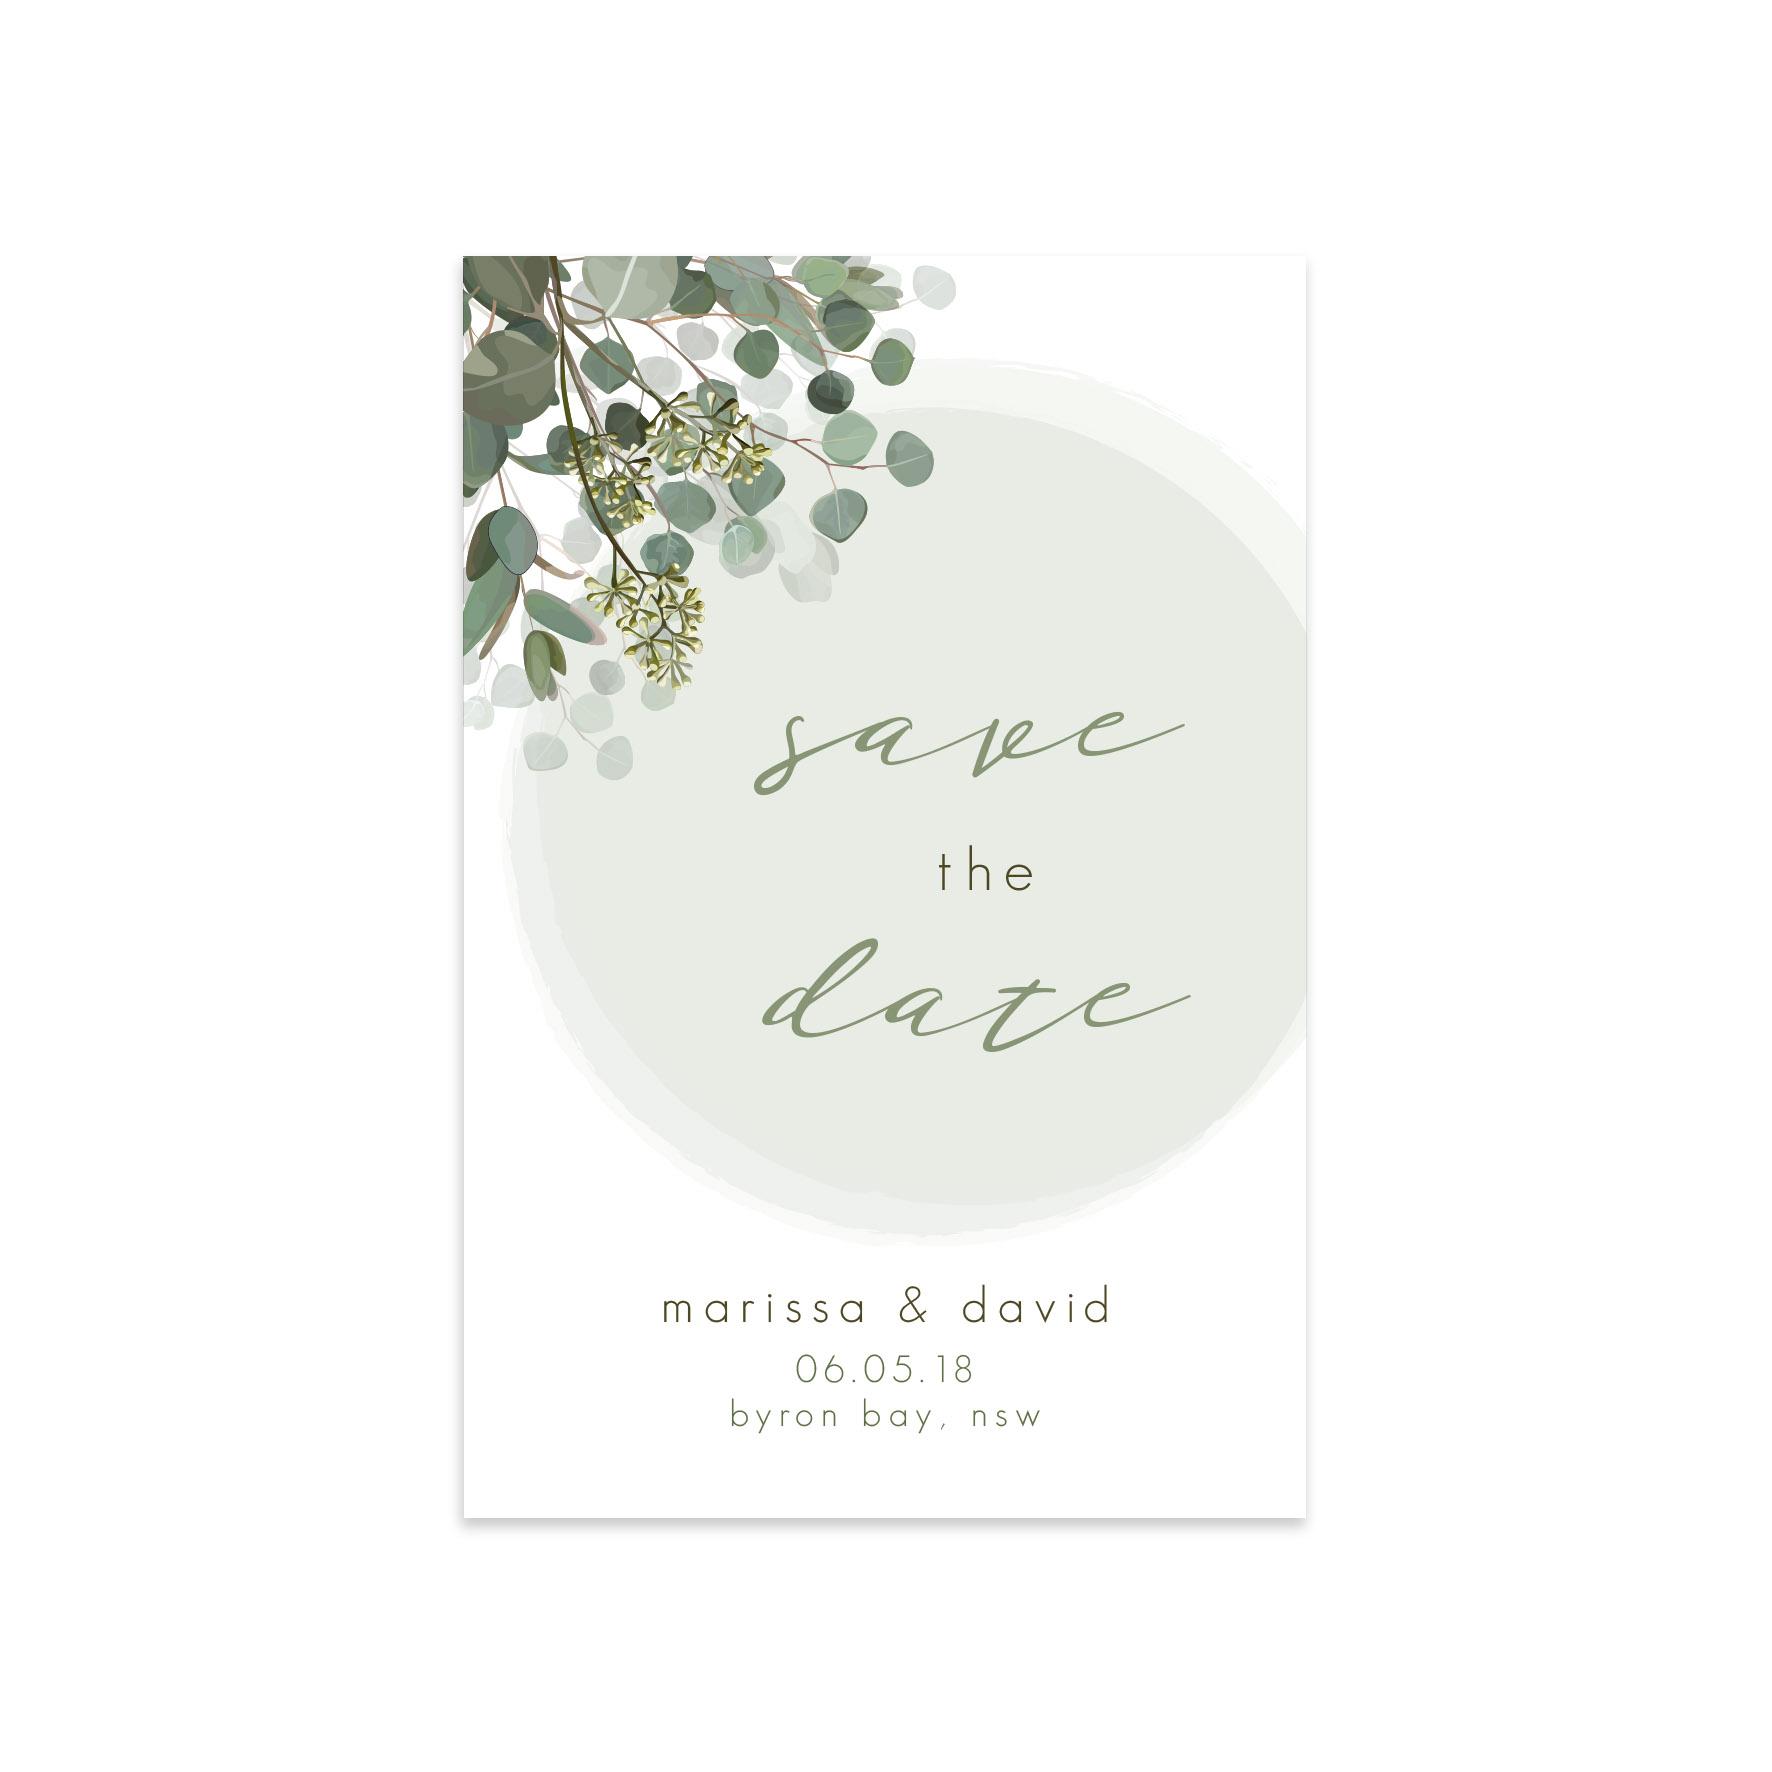 Wedding Save The Dates.Eucalyptus Save The Date Ficus And Fig Design Custom Wedding Invitations Australia